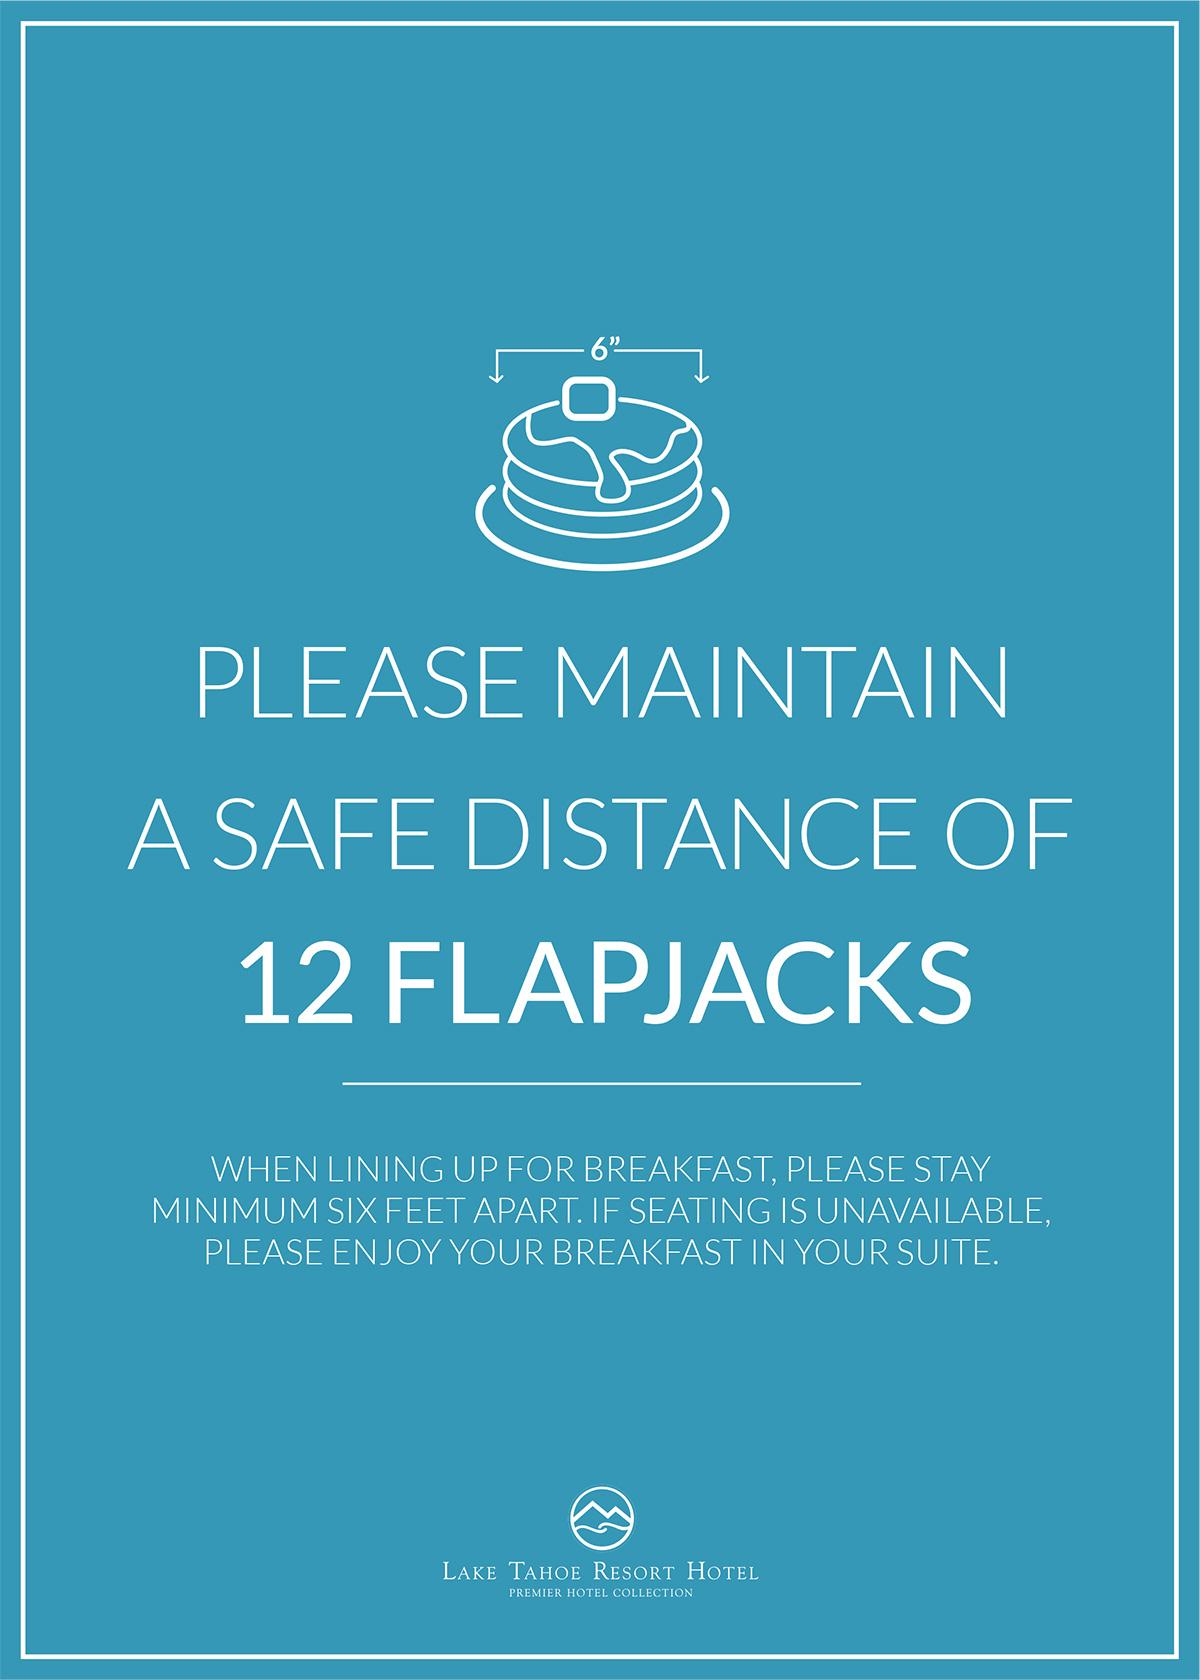 Restaurant Safety Signage